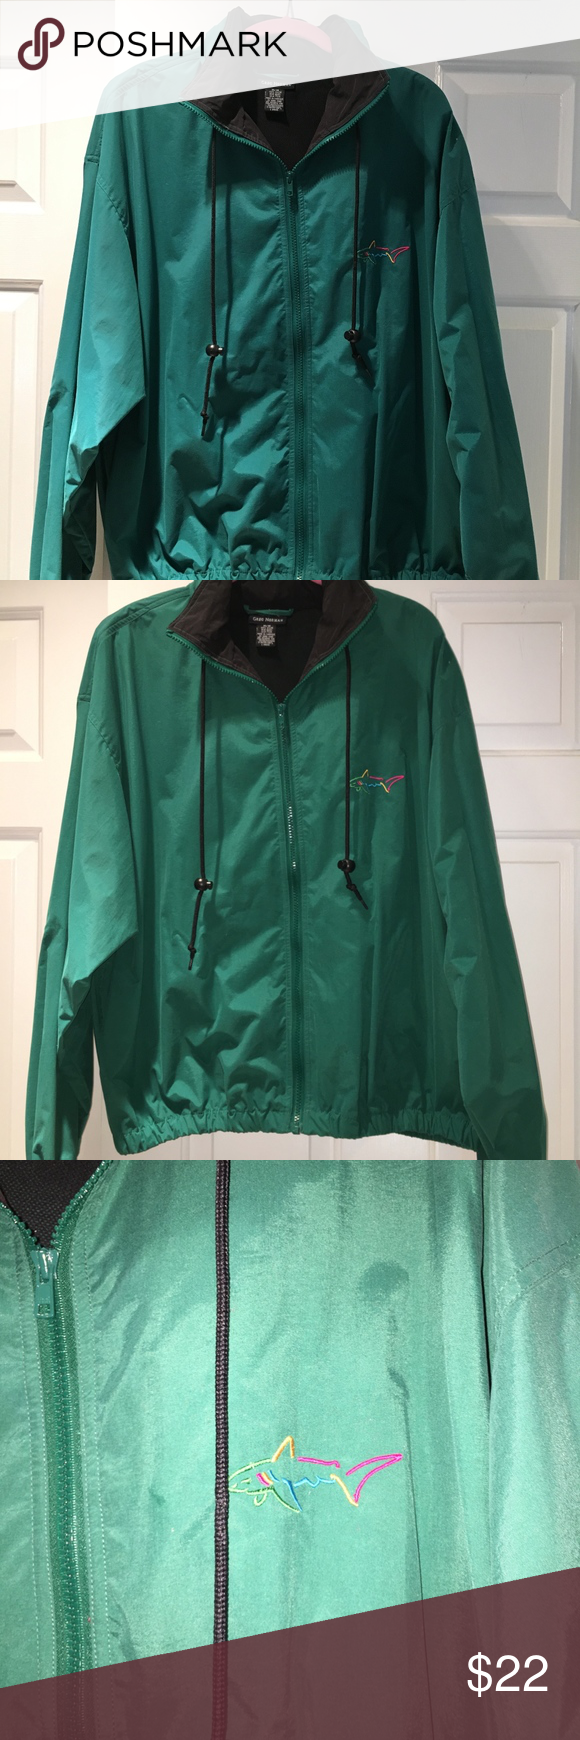 Greg Norman Men S Golf Windbreaker Jacket Windbreaker Jacket Jackets Clothes Design